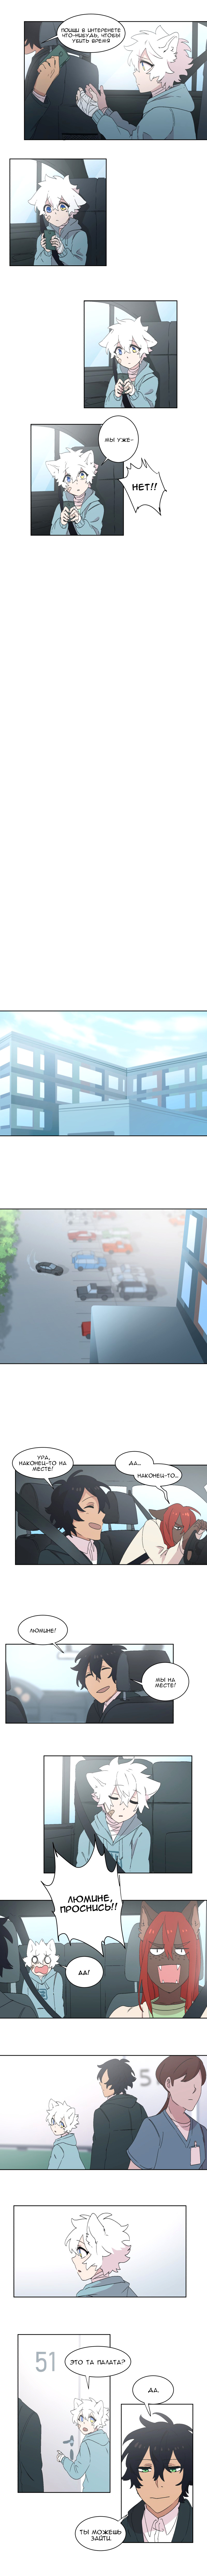 https://r1.ninemanga.com/comics/pic2/38/32806/411993/1524571742633.jpg Page 3